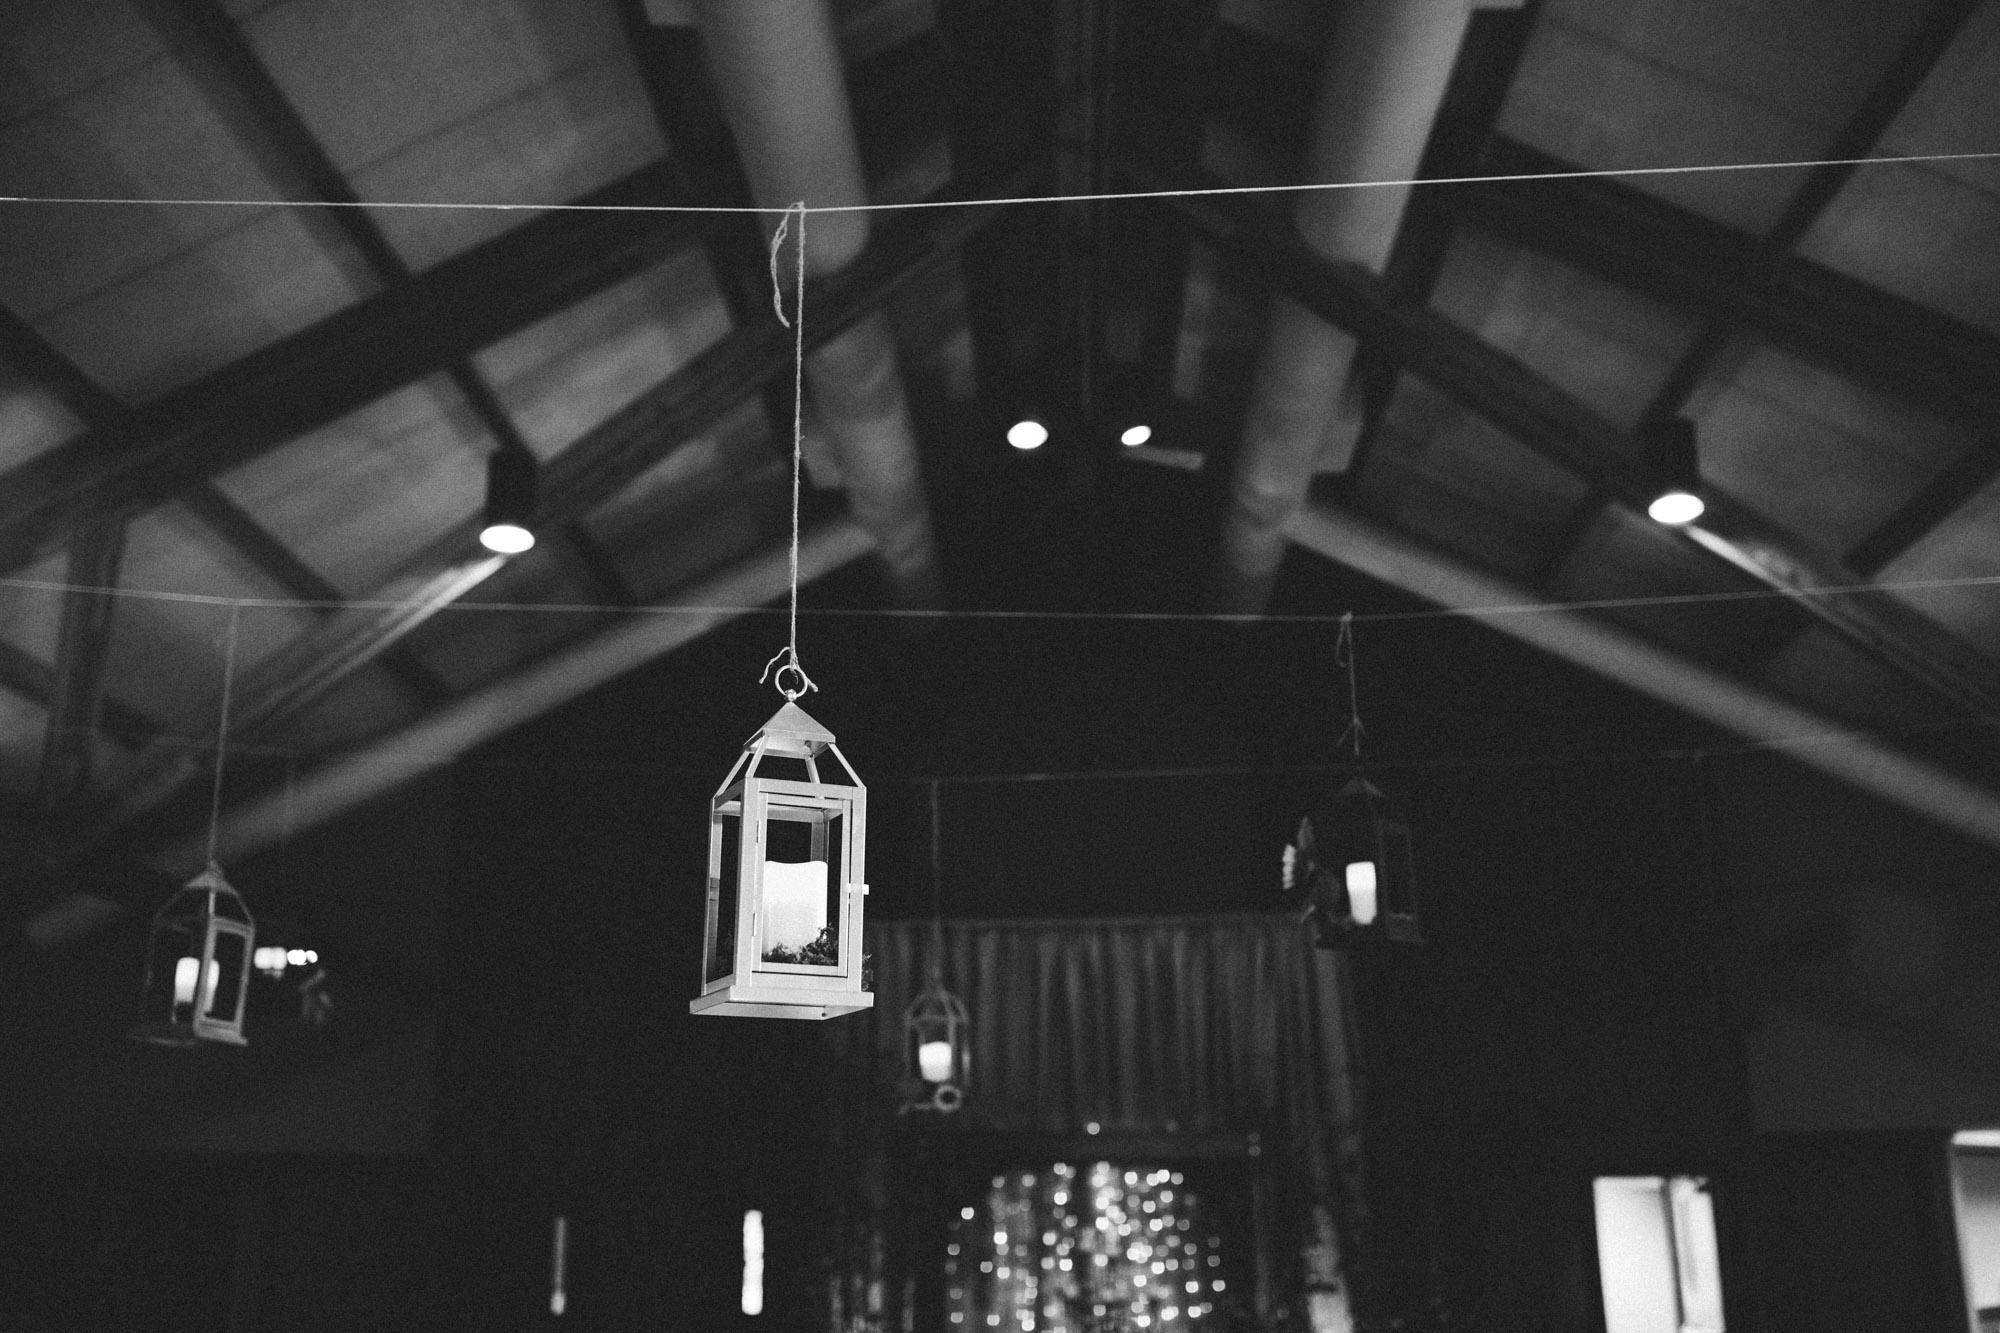 grand-view-lodge-nisswa-minnesota-wedding-photography